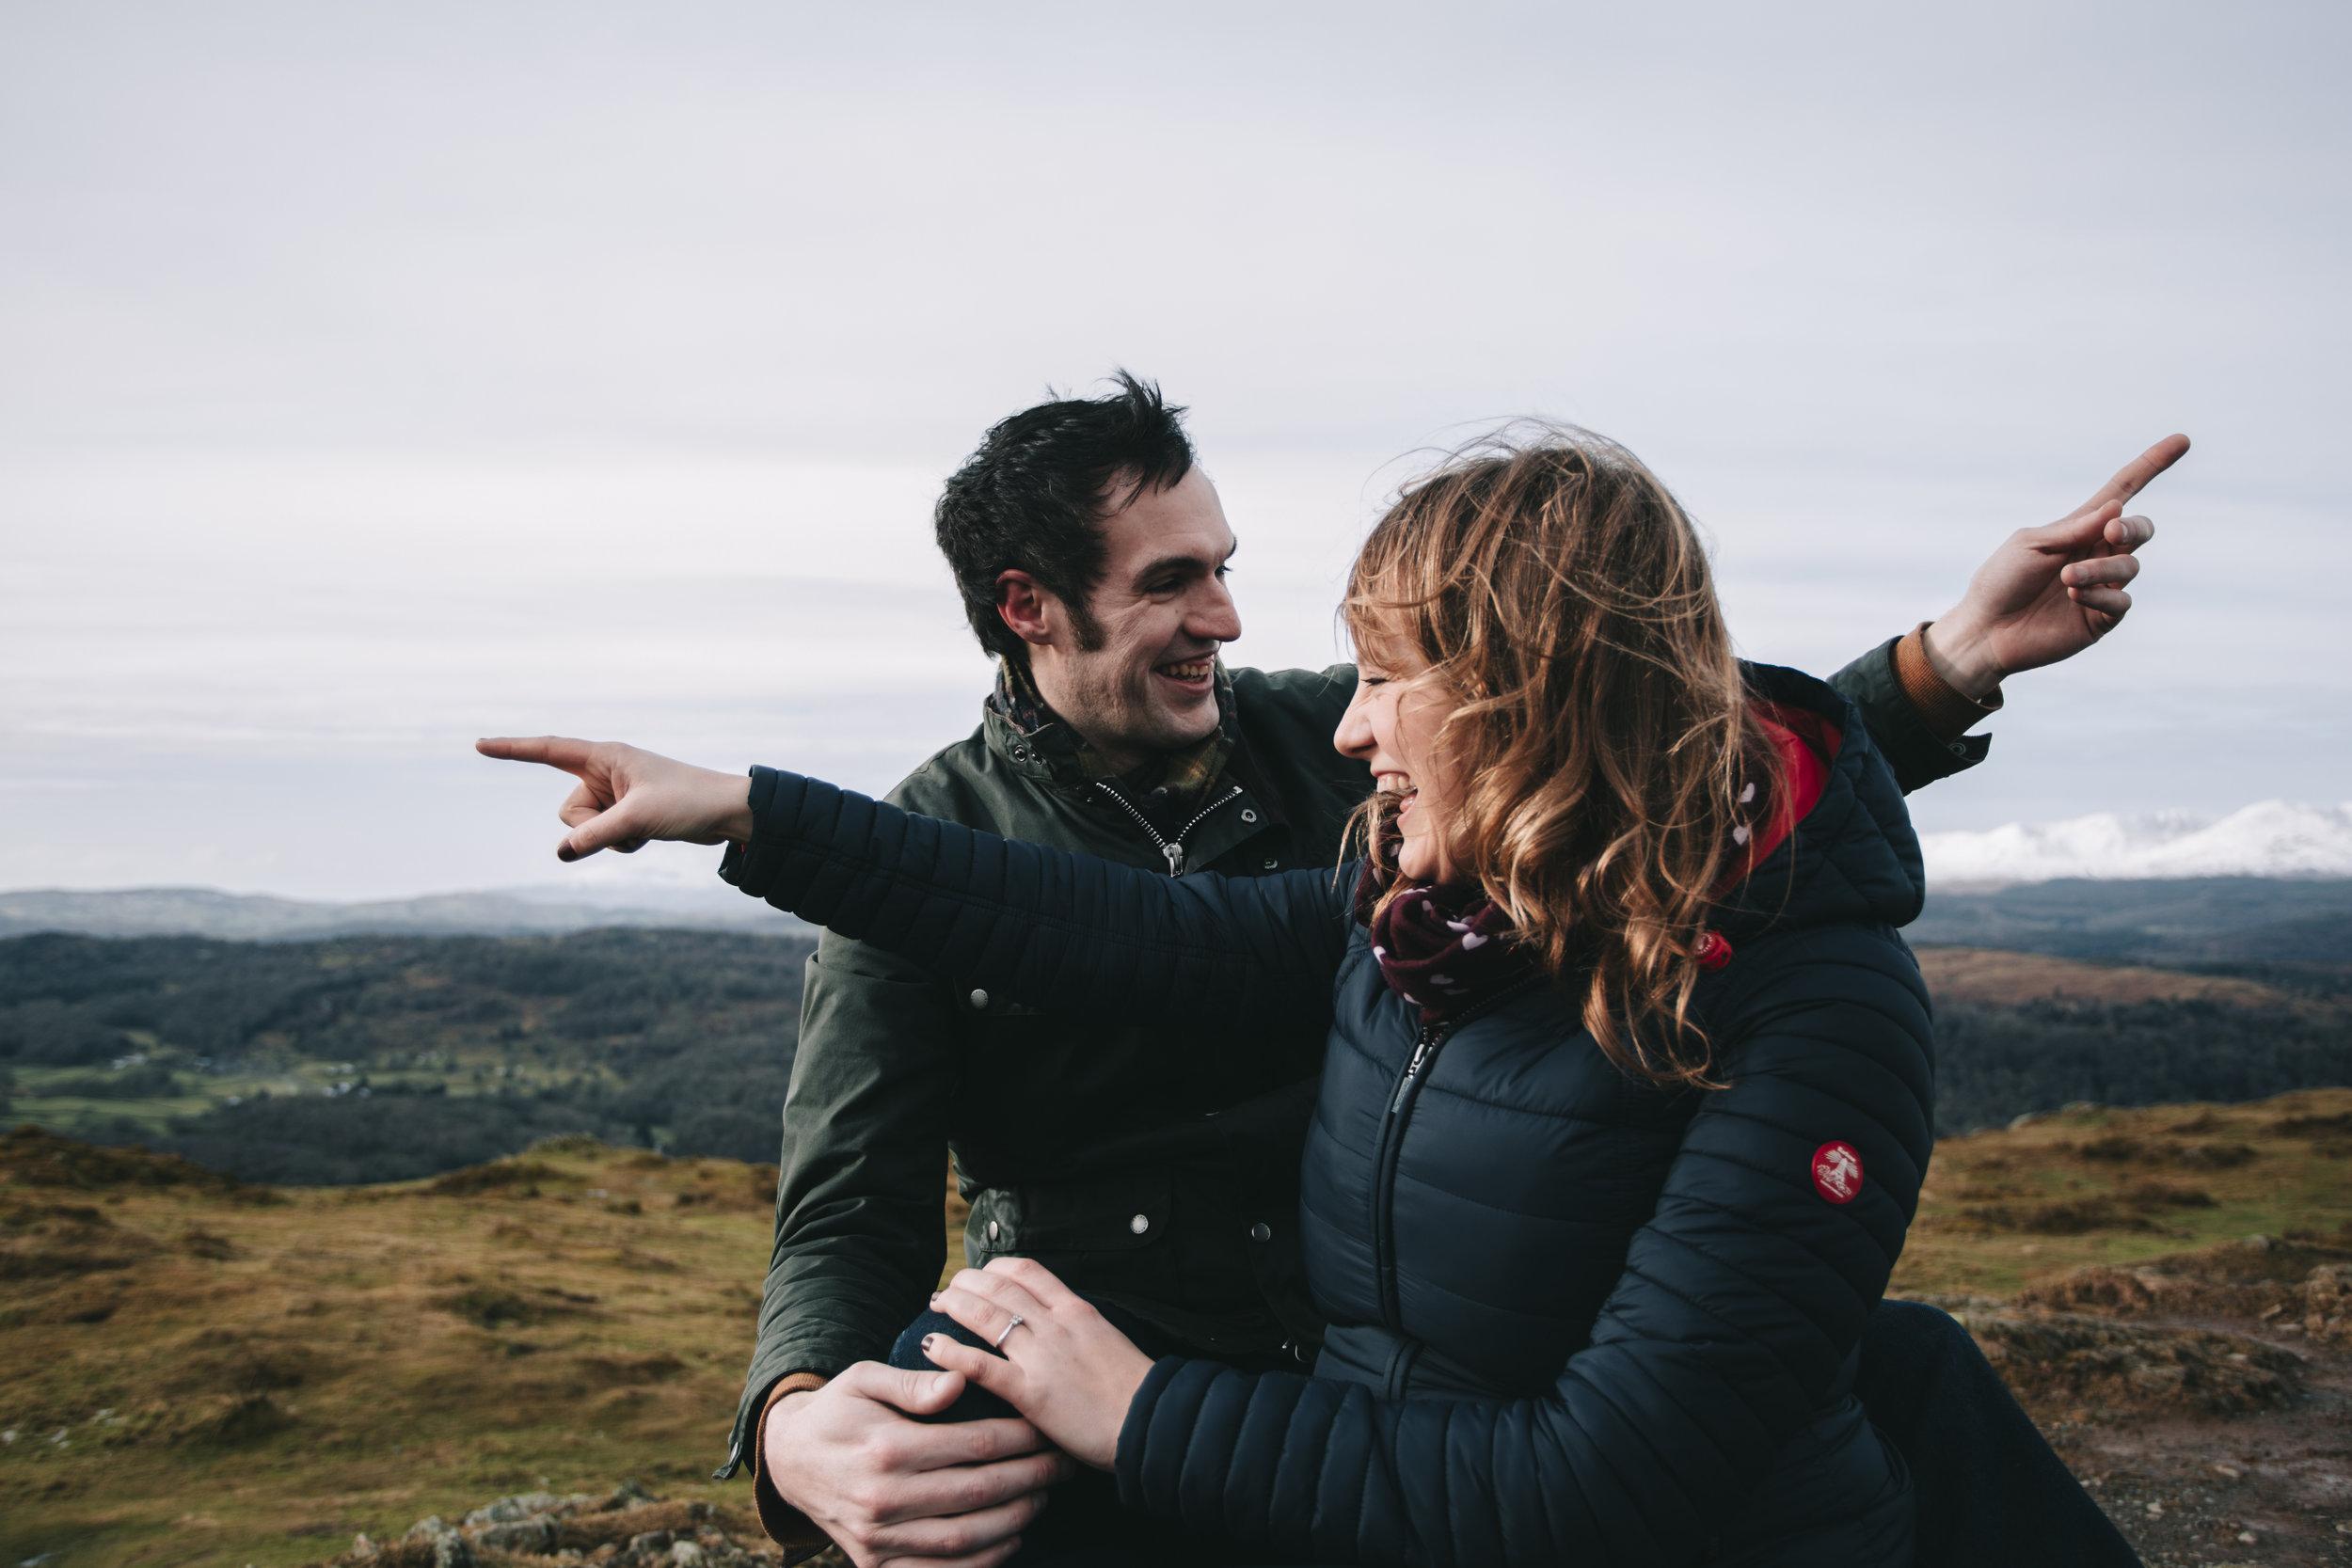 Alex + Matt - Windermere Engagement Photography - Claire Basiuk - 24.jpg